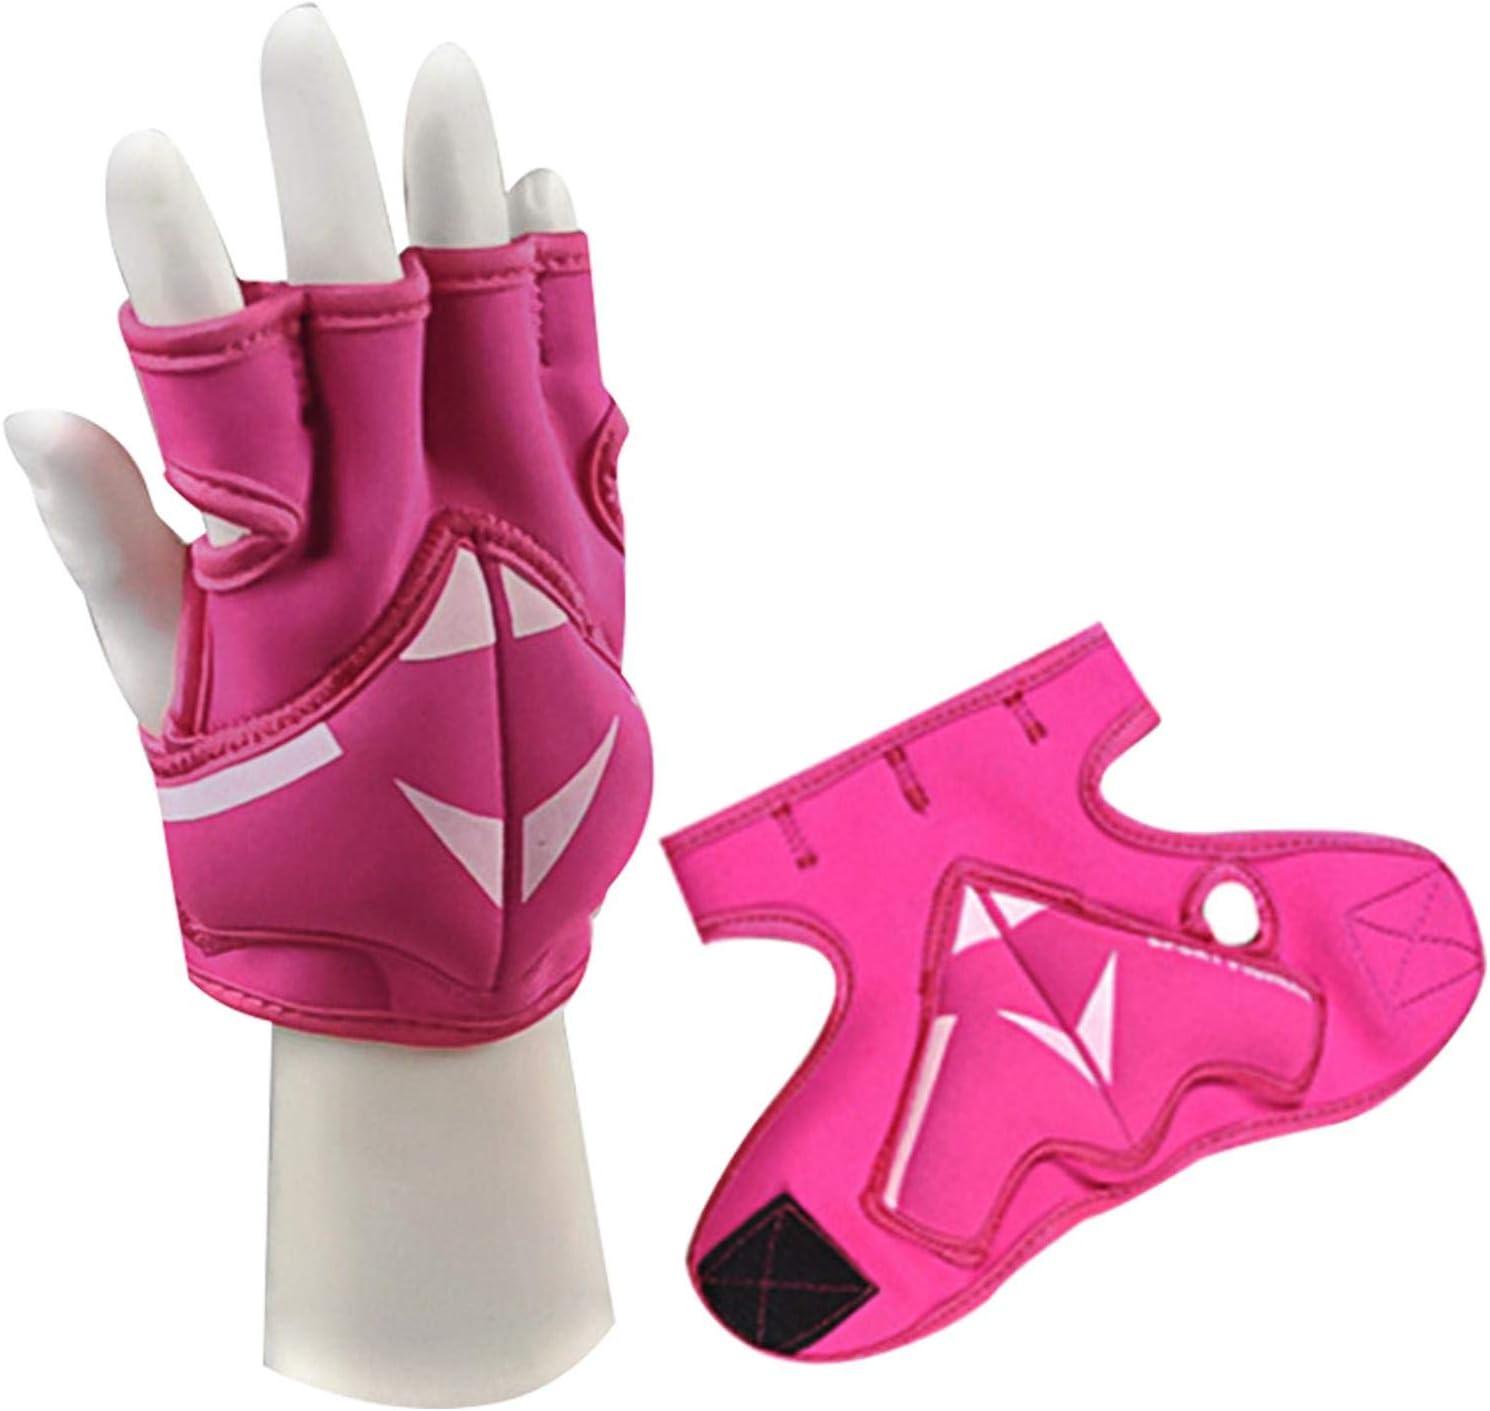 StepOK Weighted Gloves 2LB(1LB Each) for Men Women Exercise Glov